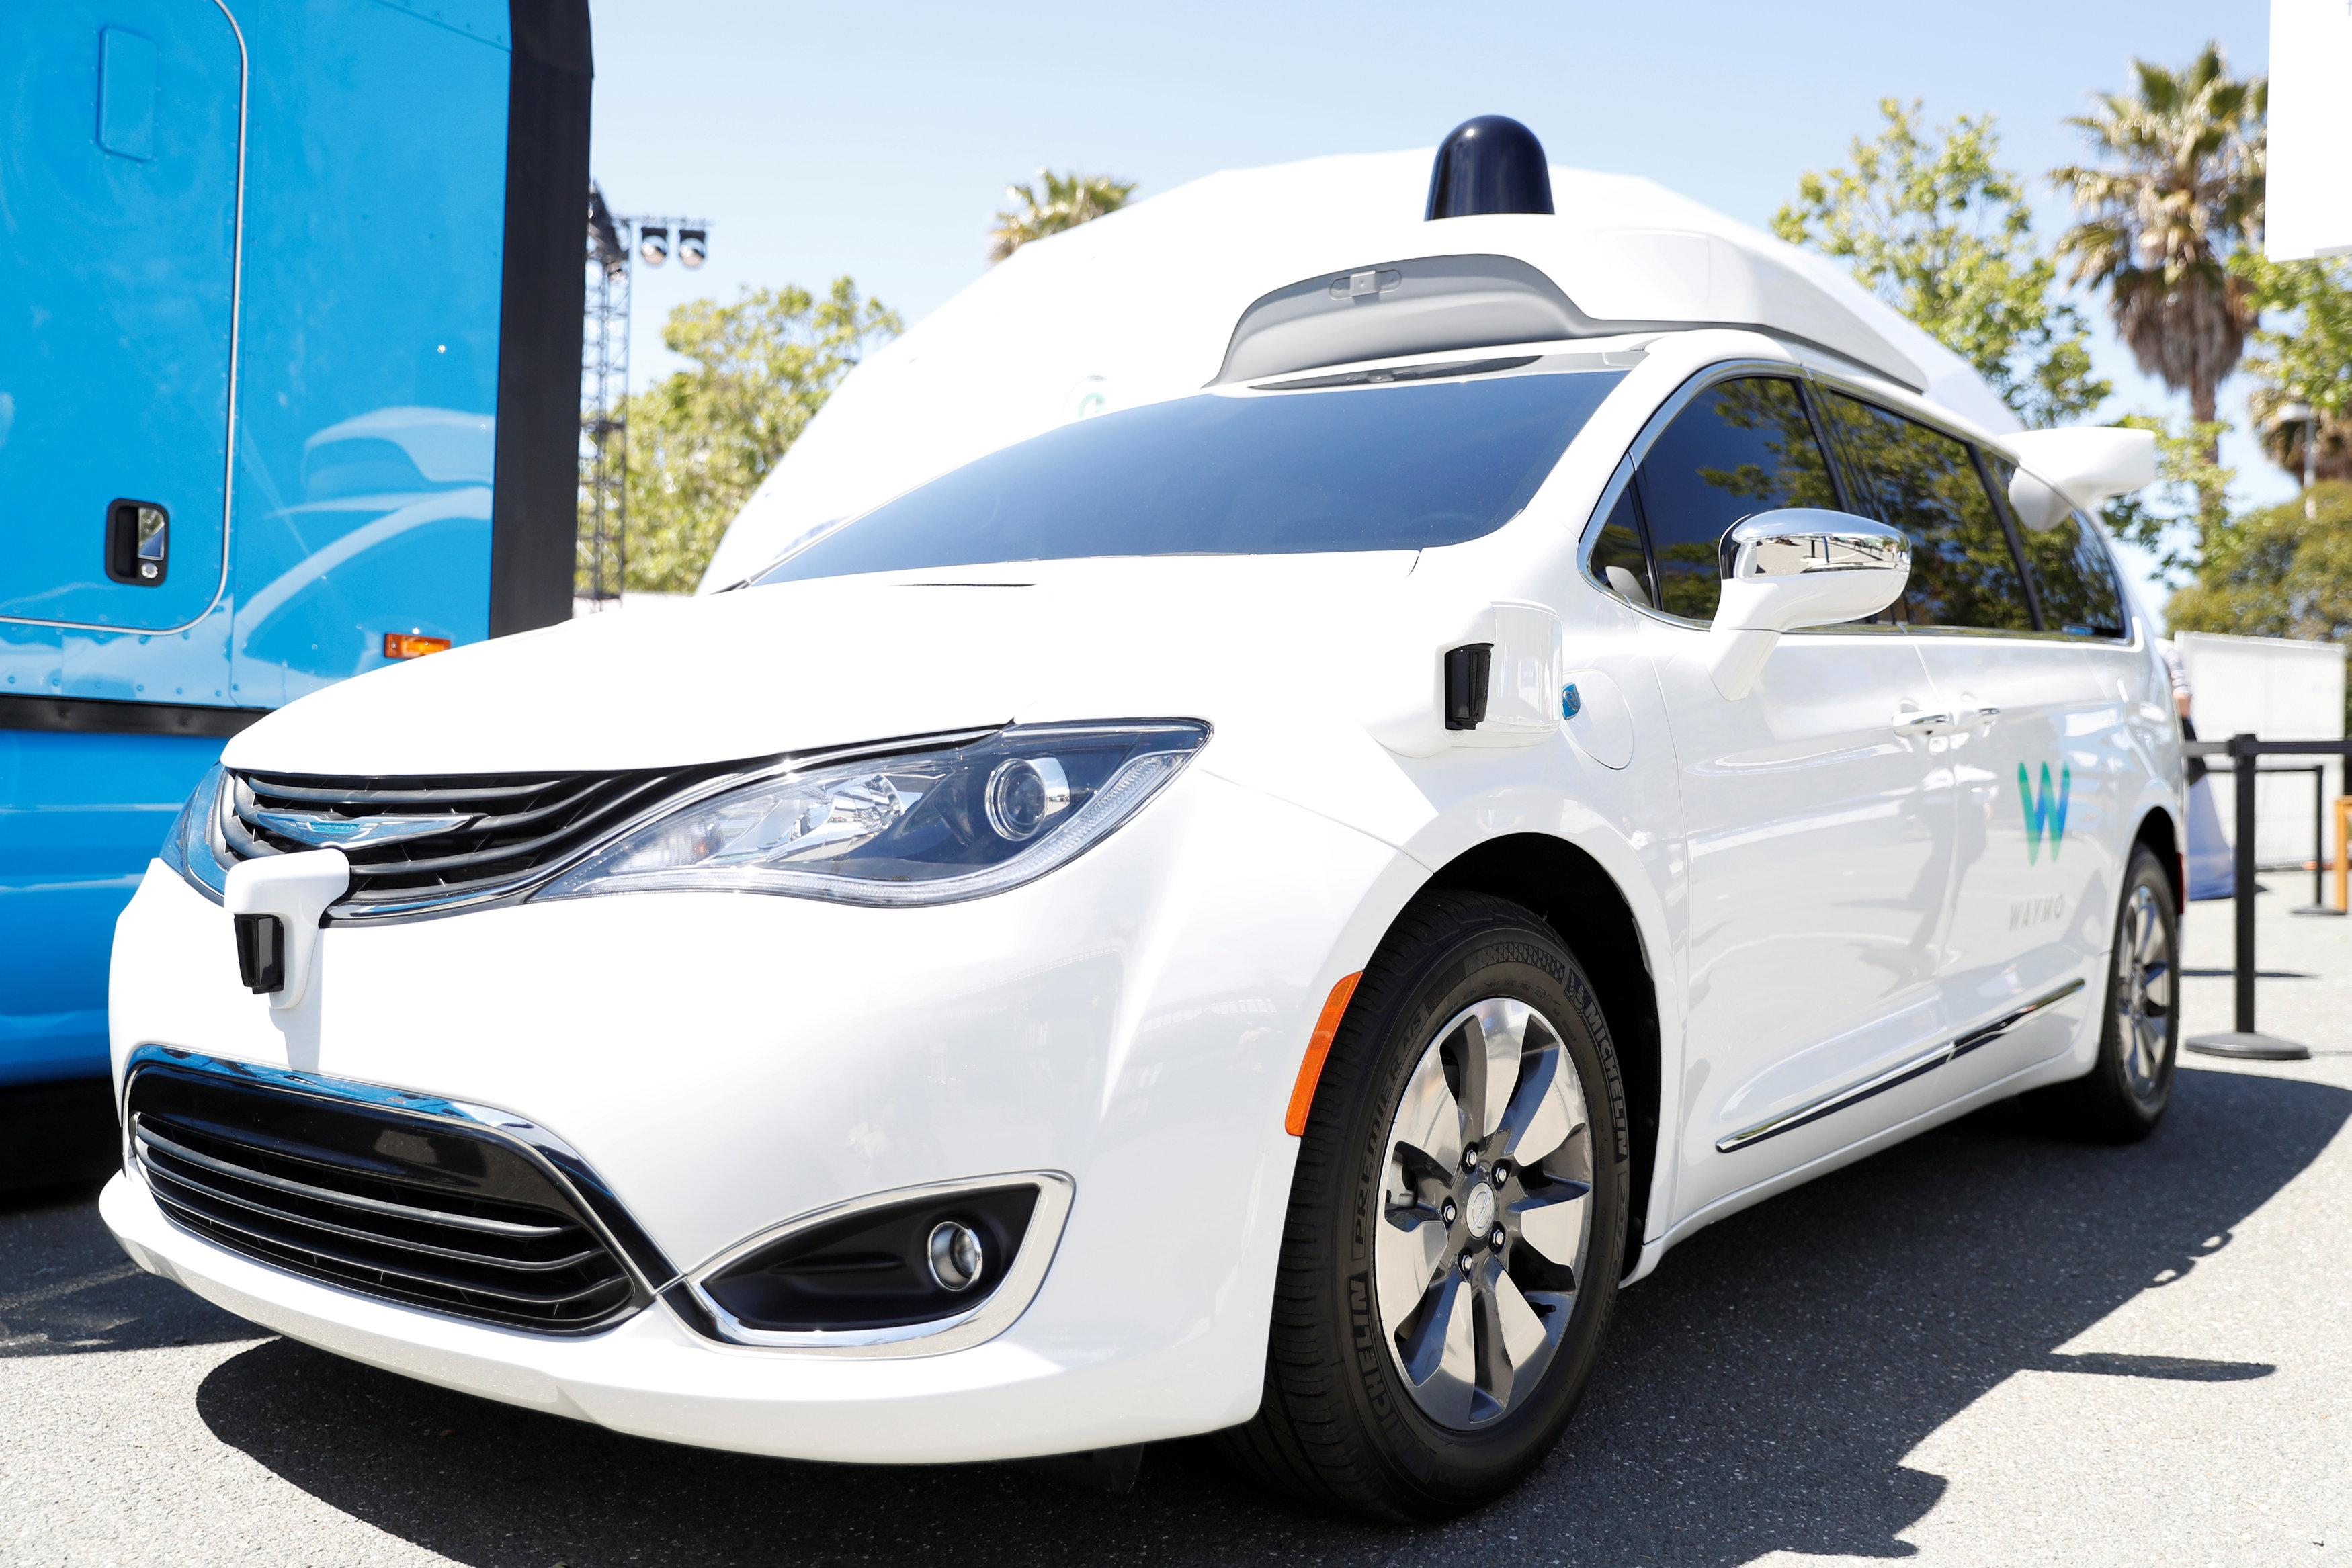 Self-driving cars may hit U.S. roads in pilot program: NHTSA